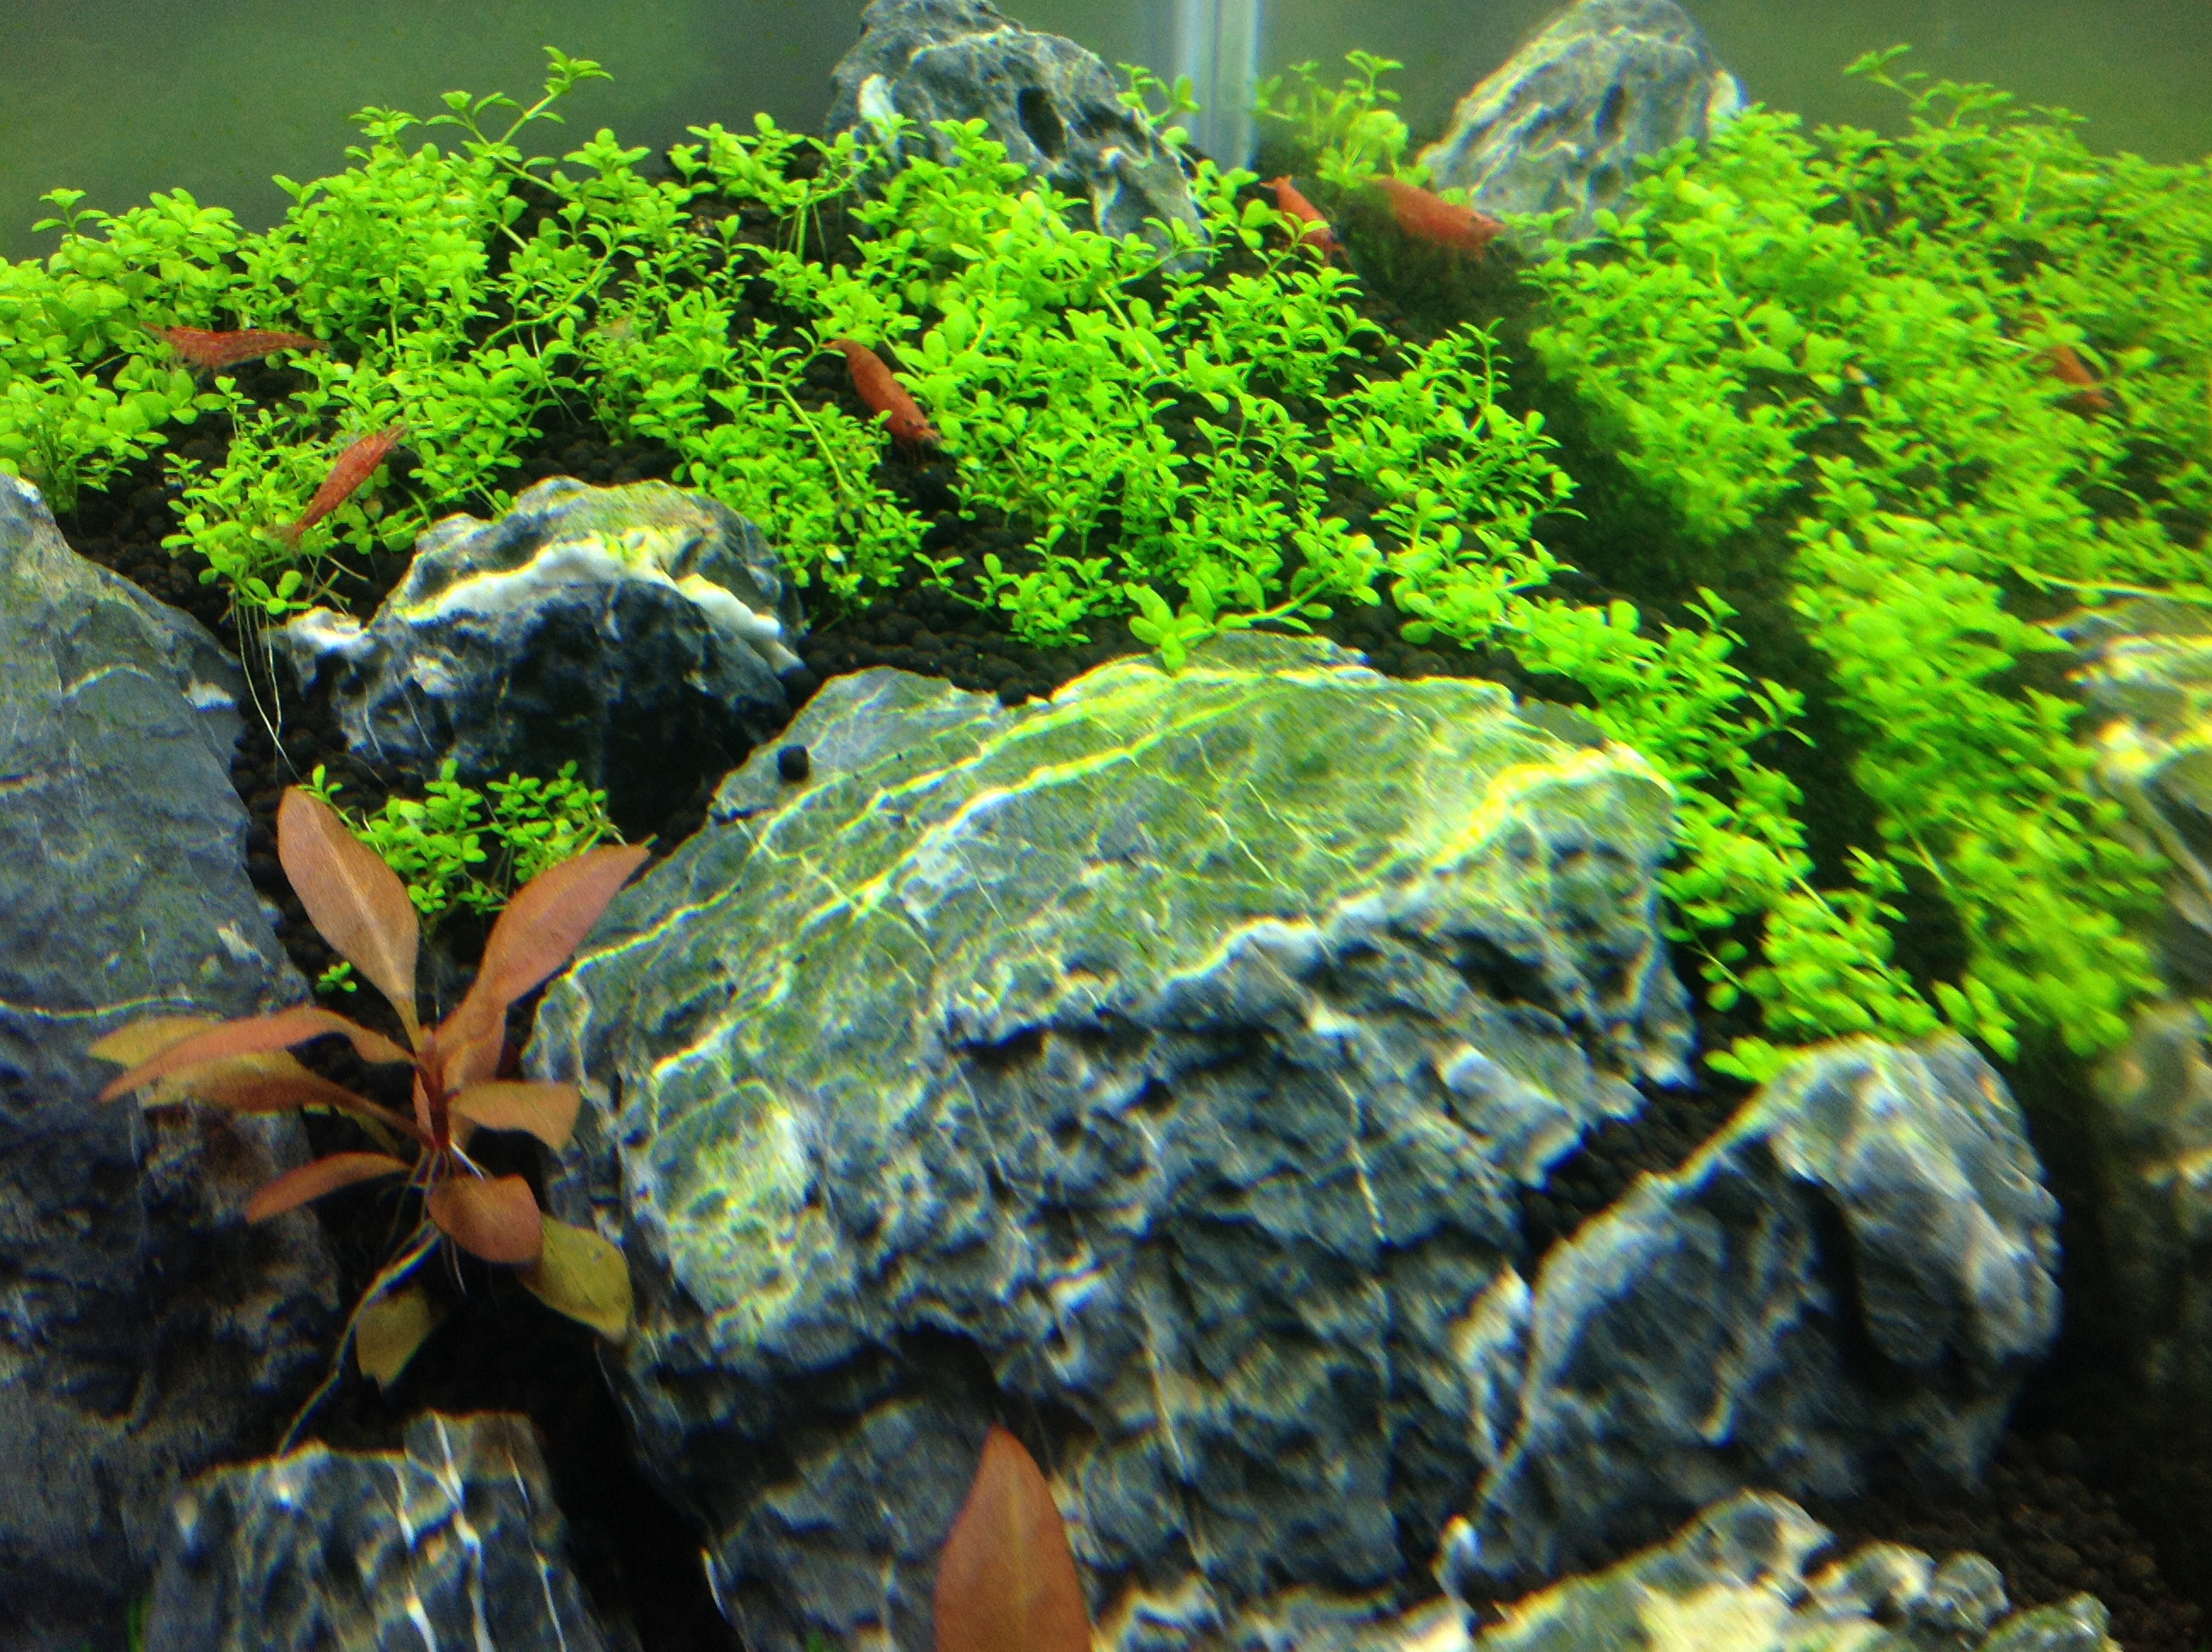 ... ich bekomme auch langsam Algen - Algen im Aquarium - Aquascaping Forum